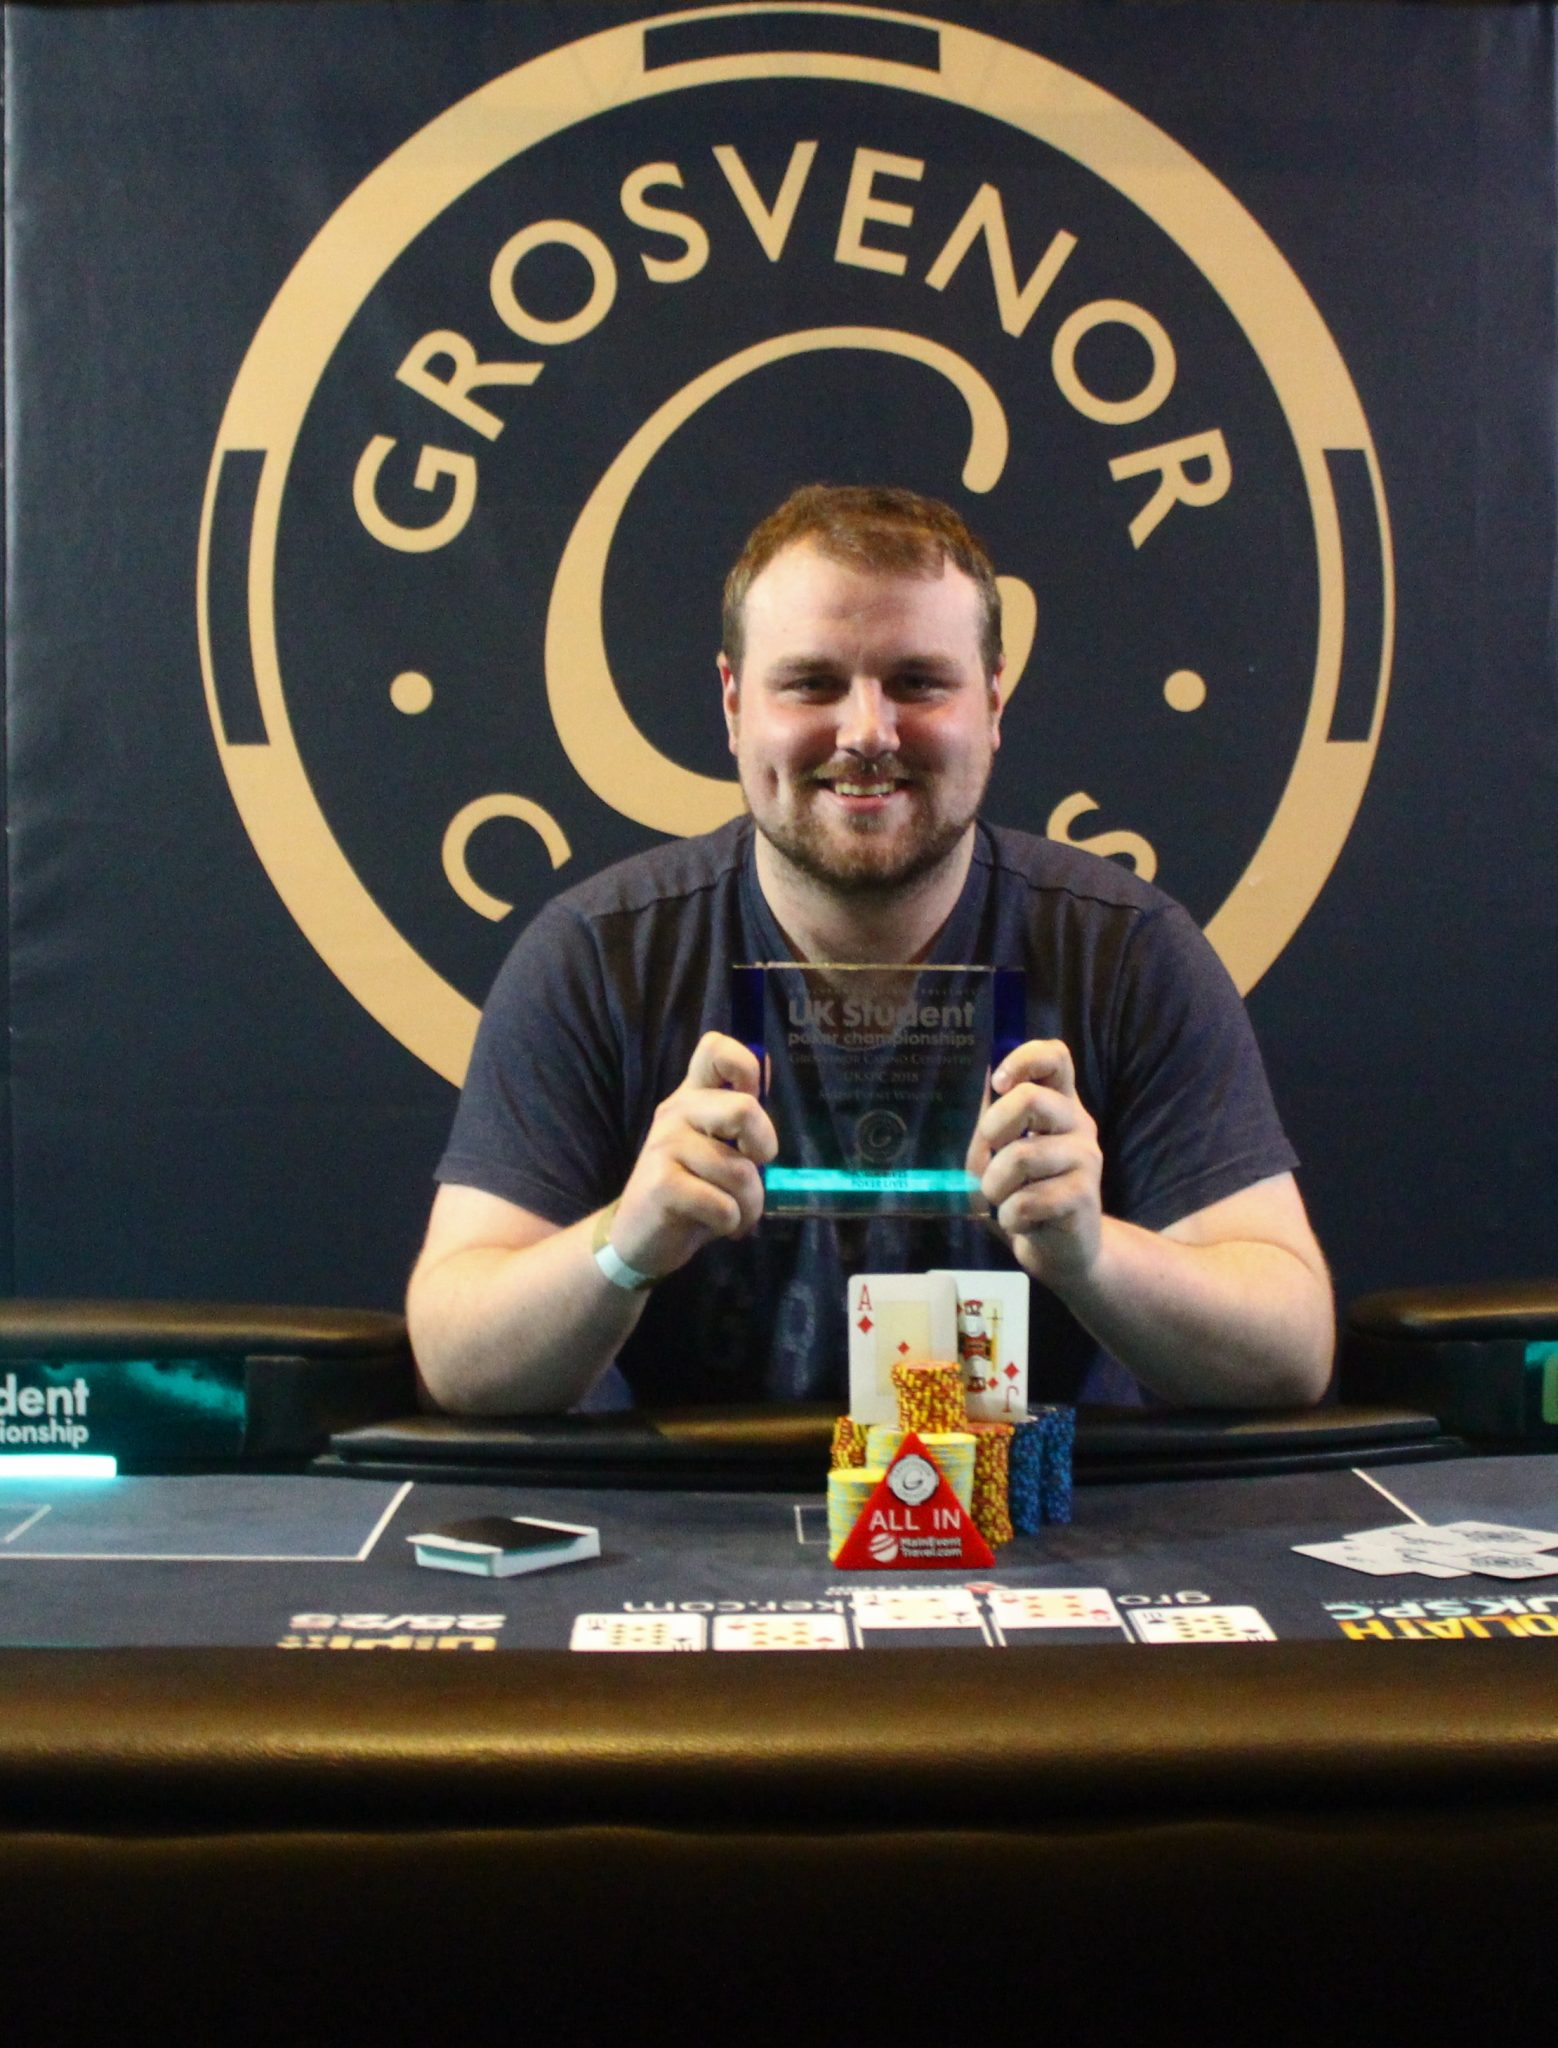 Grosvenor leeds poker results casino catalogue jouet